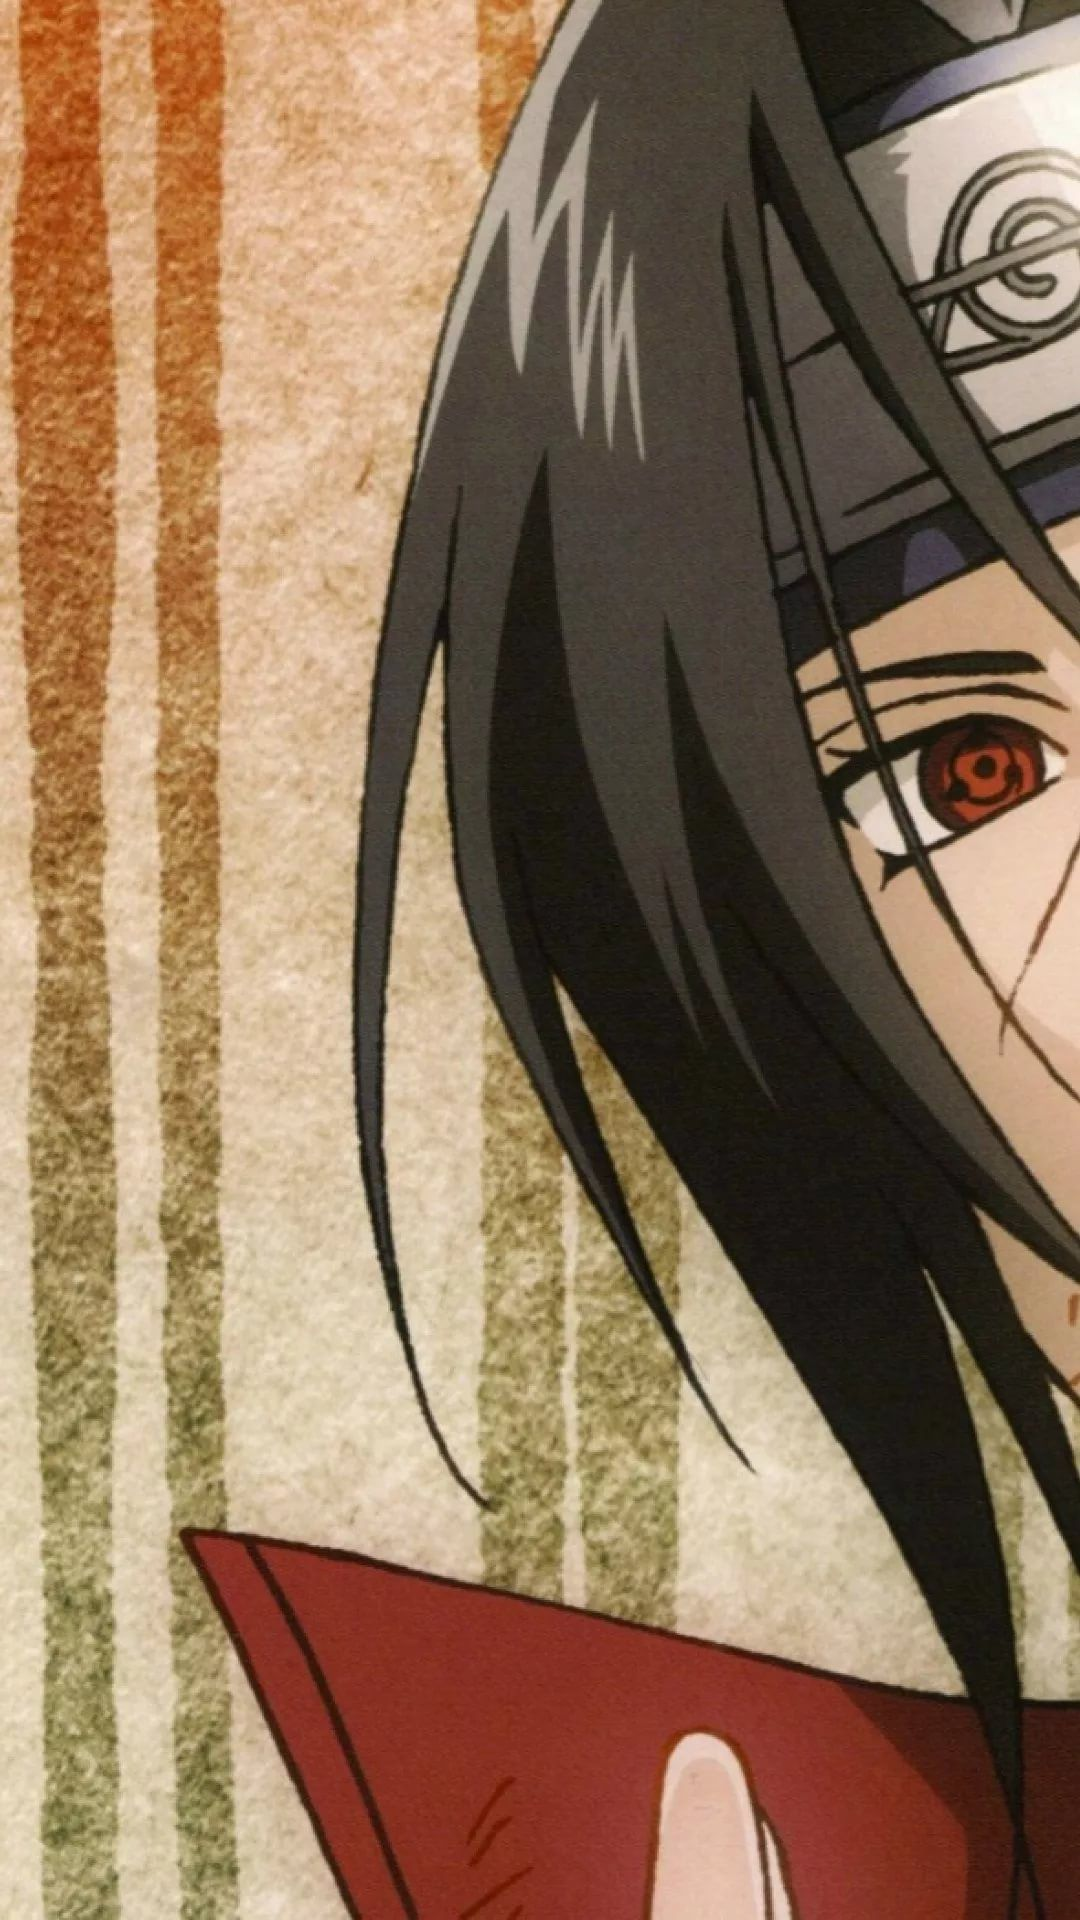 Sasuke Apple wallpaper